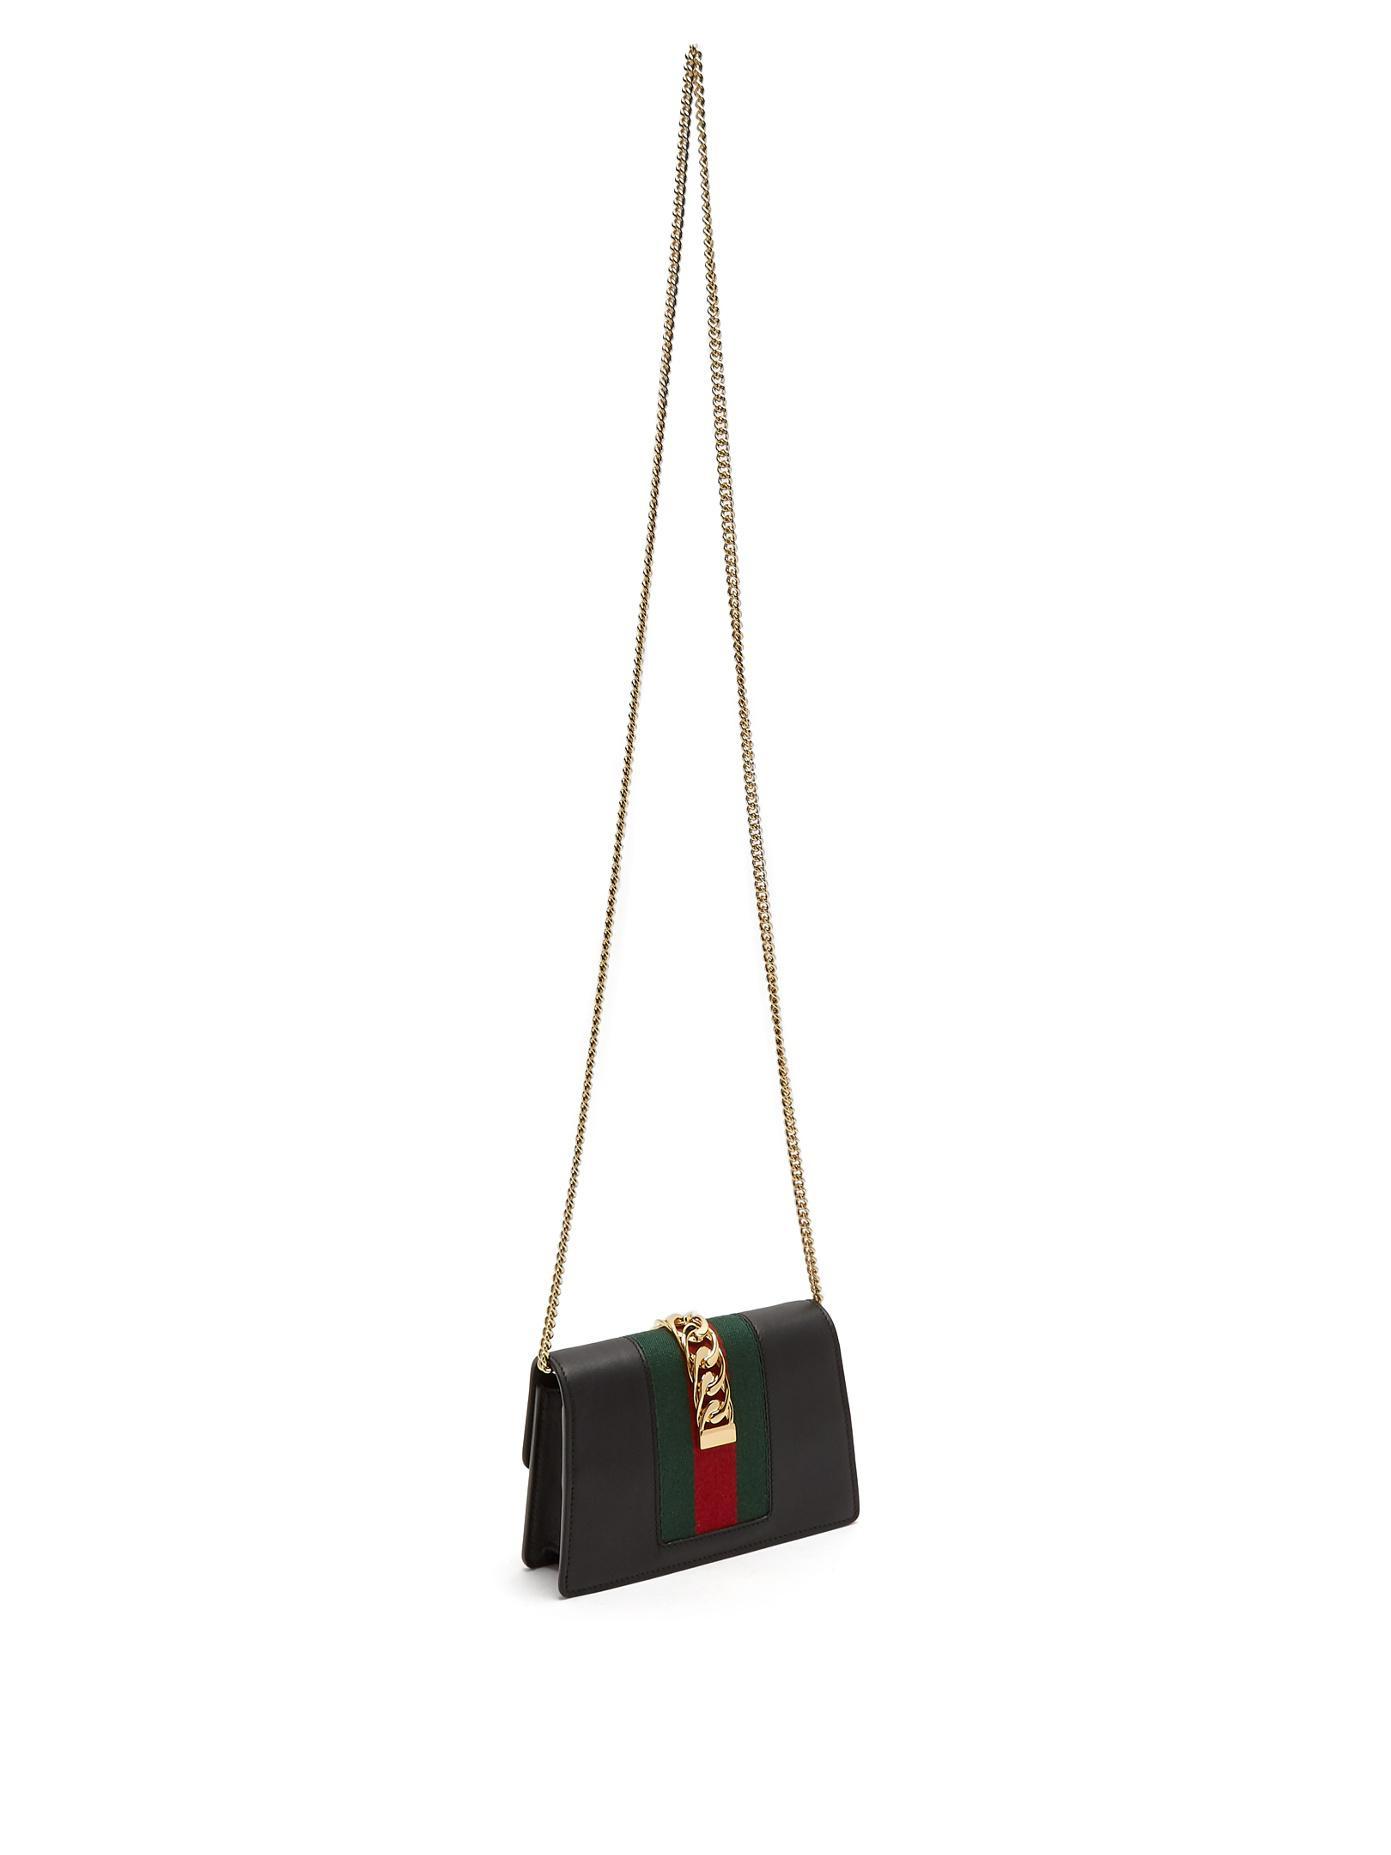 c4dc8b4f2105 Lyst - Gucci Sylvie Super Mini Leather Shoulder Bag in Black